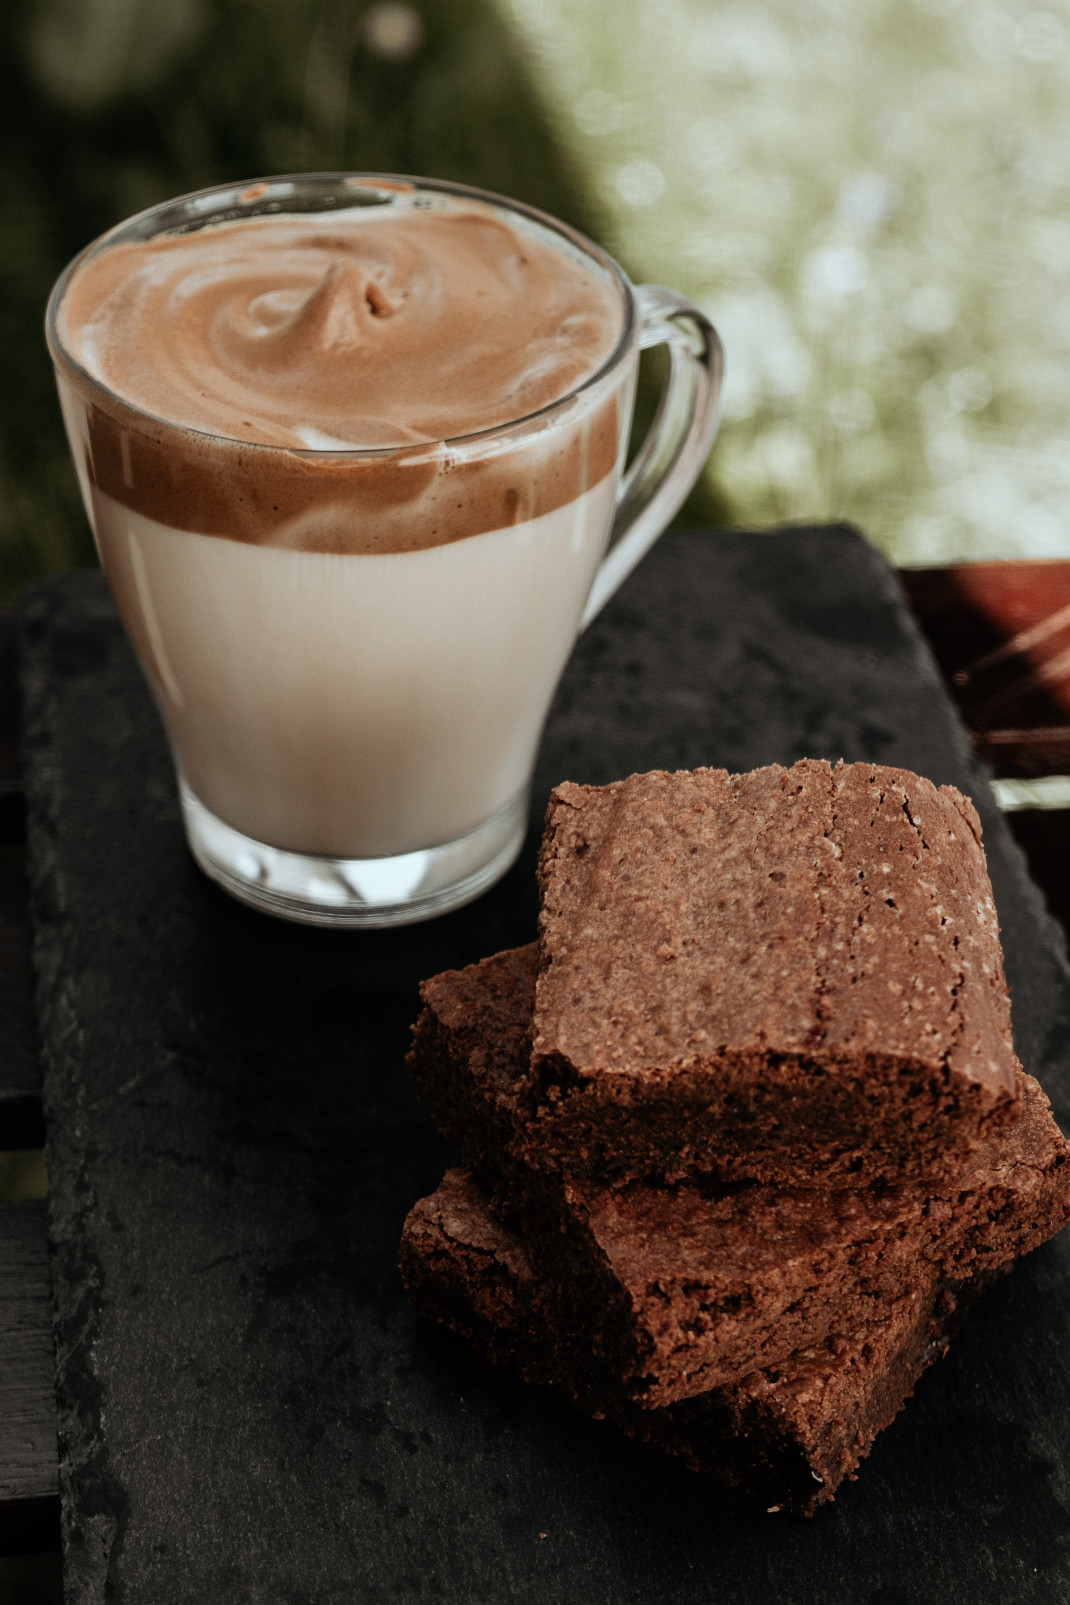 Dalgone coffee & choco cake